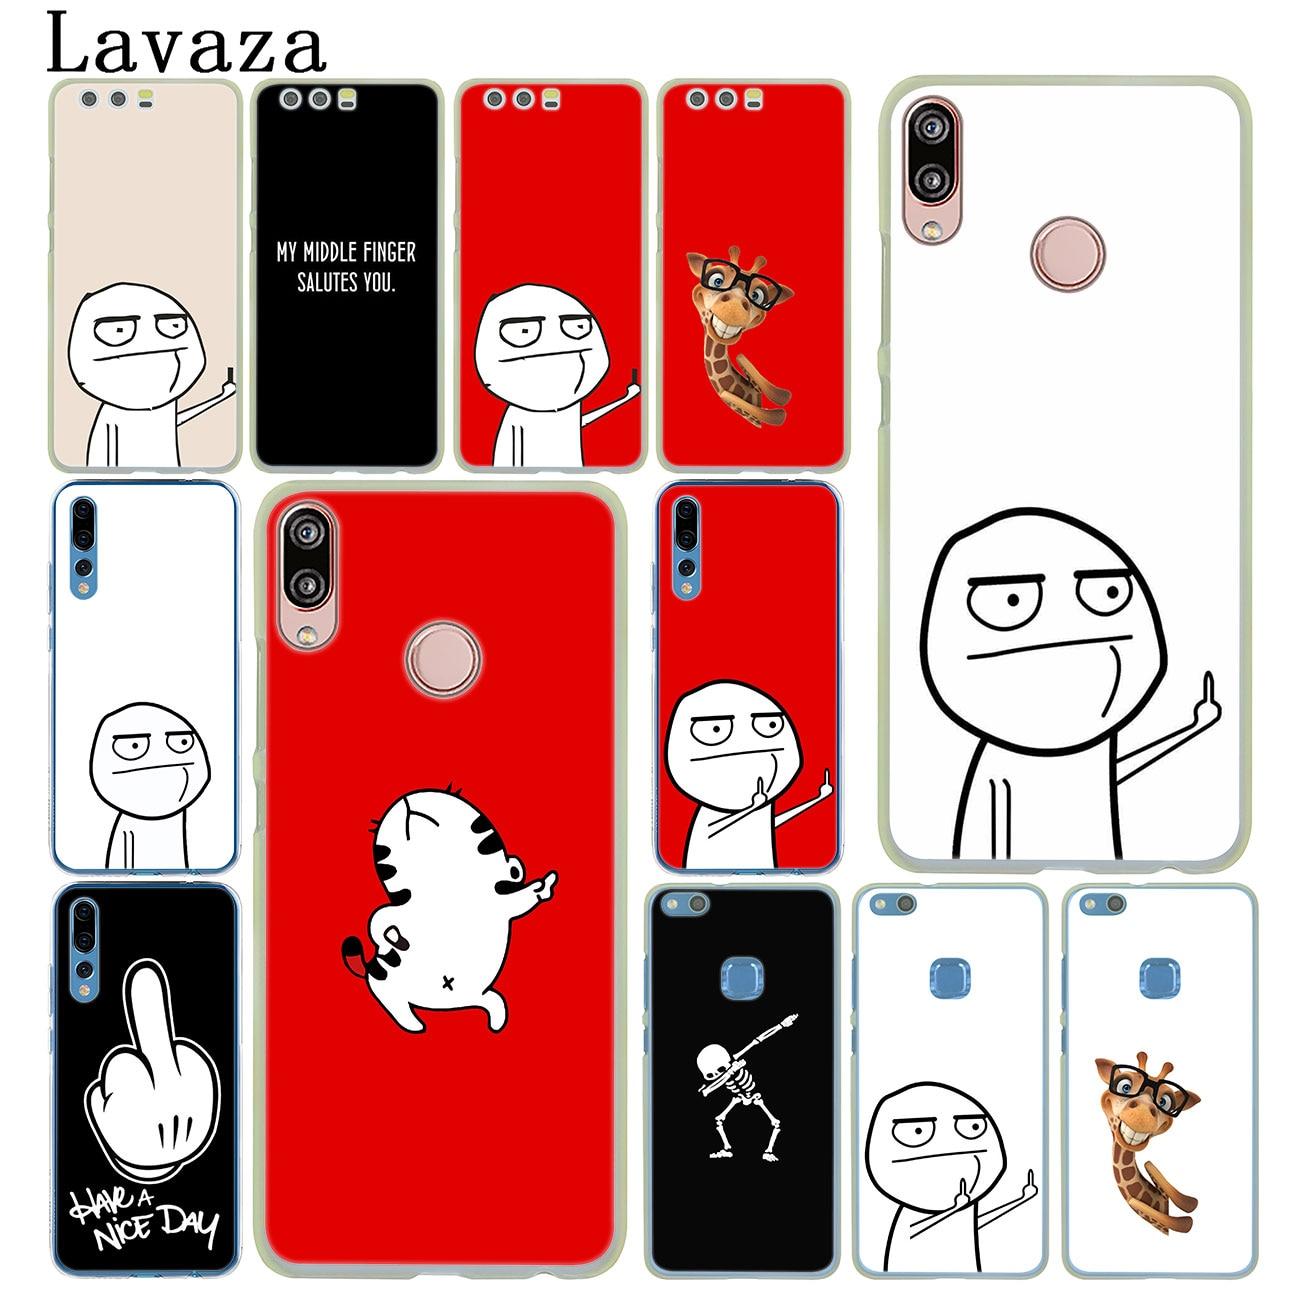 Cara meme Meio Dedo Engraçado Amantes Dos Desenhos Animados Case for Huawei Y9 Y6 Y7 Prime 2018 2019 Honra 20 8C 8X8 9 9X10 Lite 7X 7A Pro